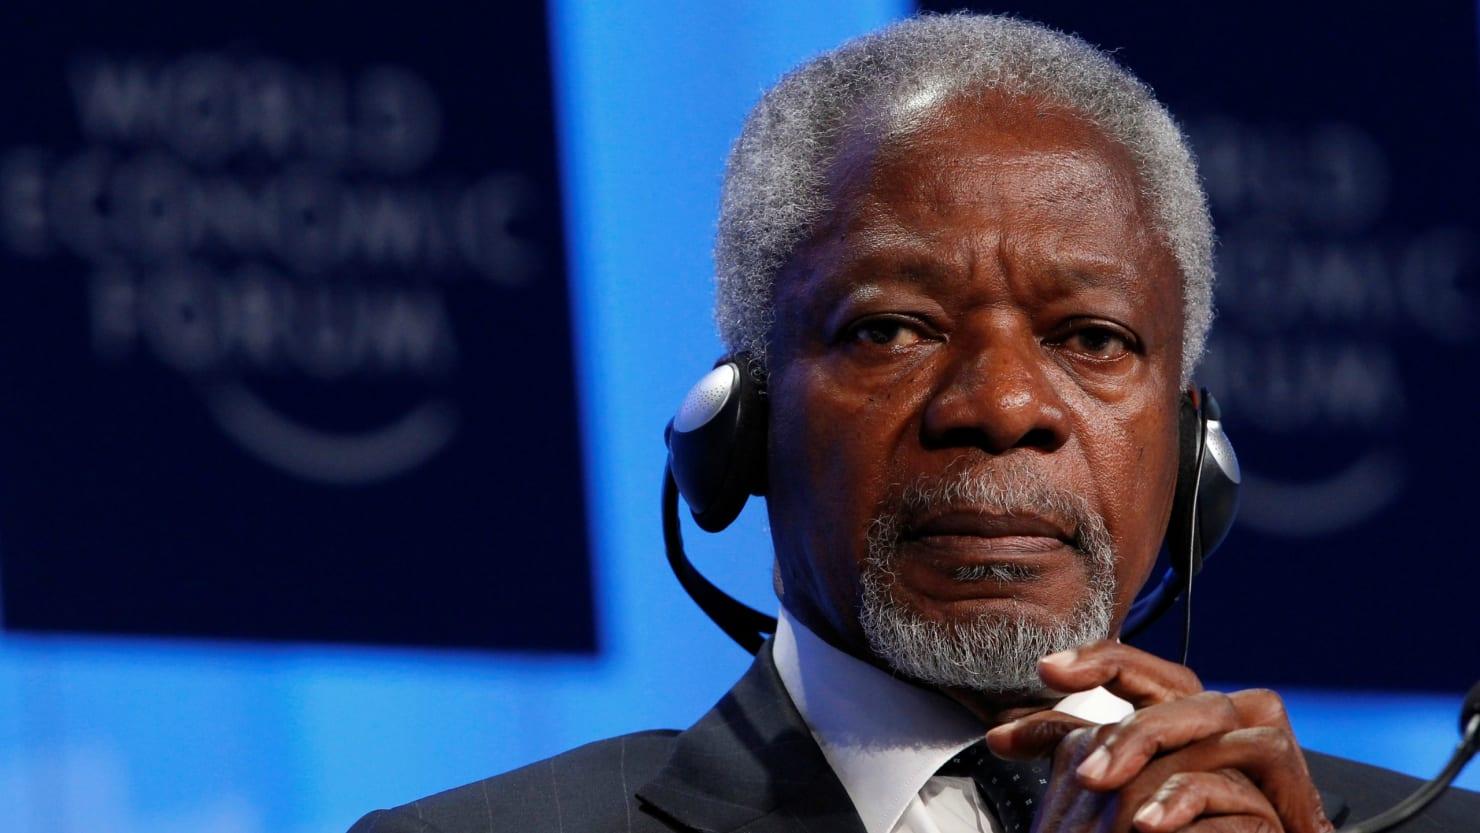 Former UN Secretary General dies at 89